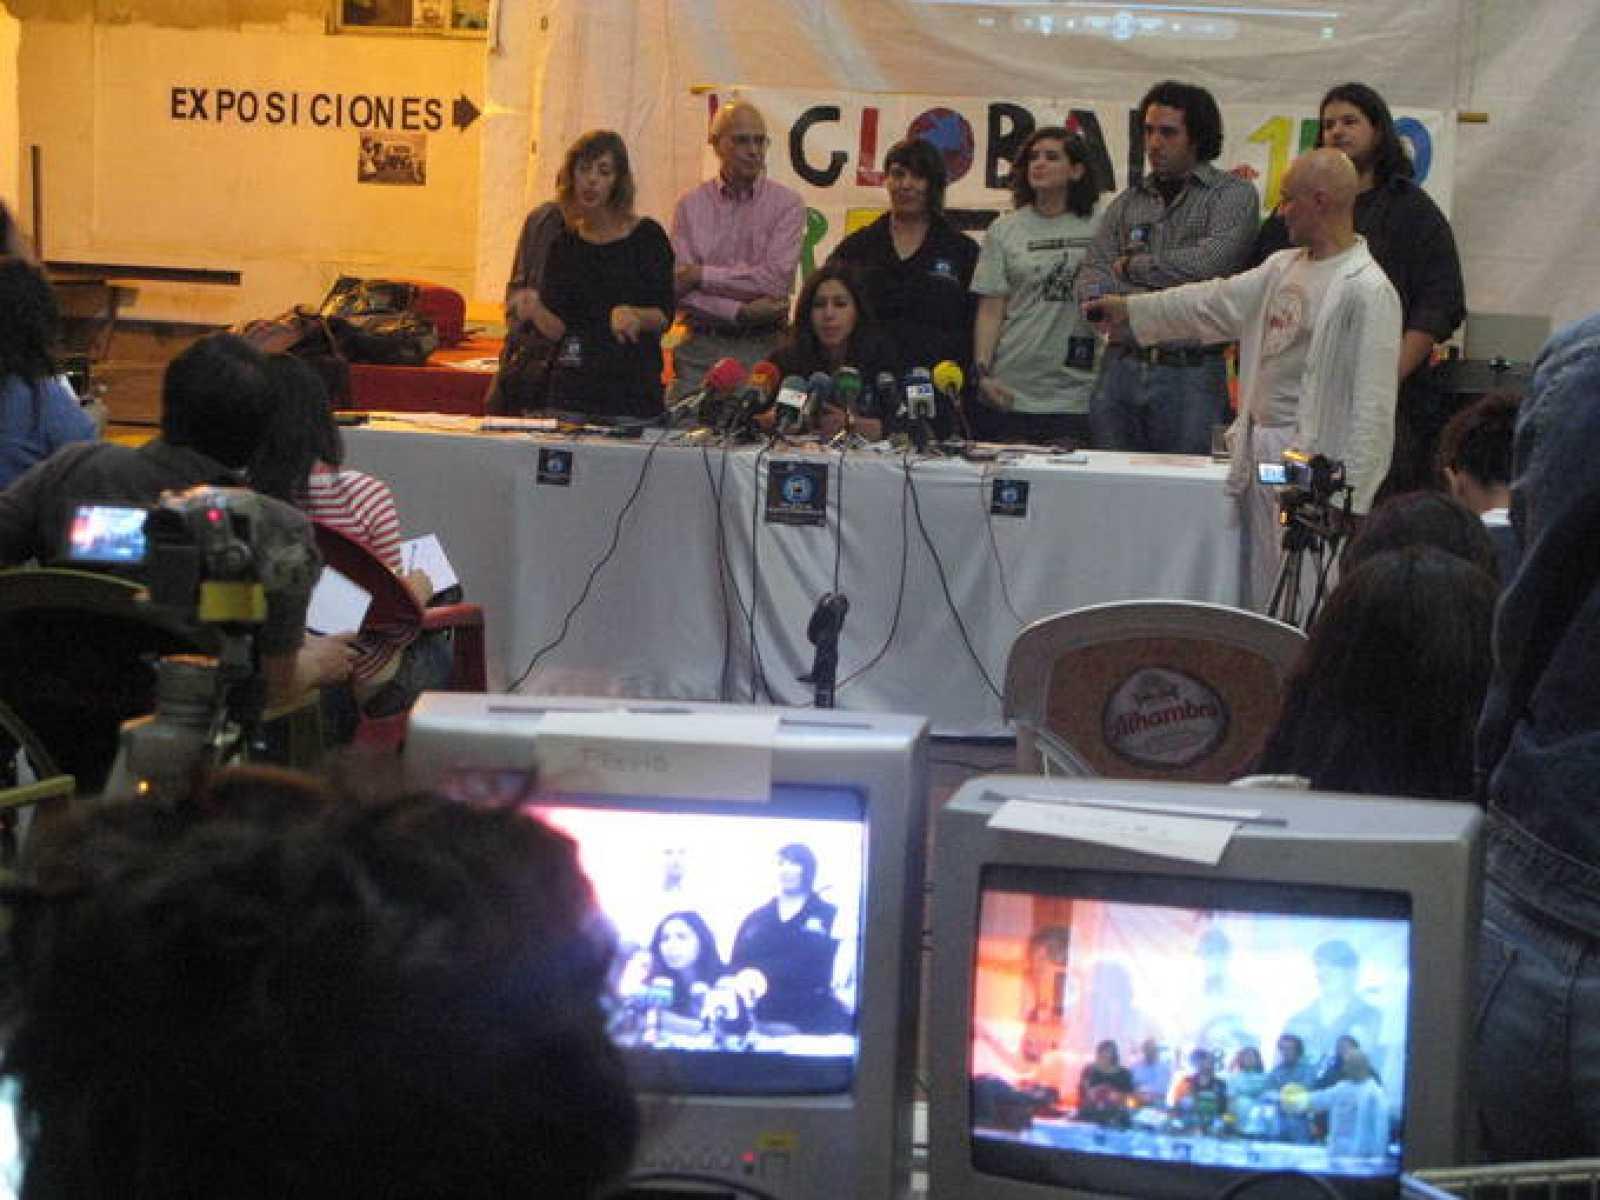 Rueda de prensa de portavoces del 15m para presentar la convocatoria del 15-O